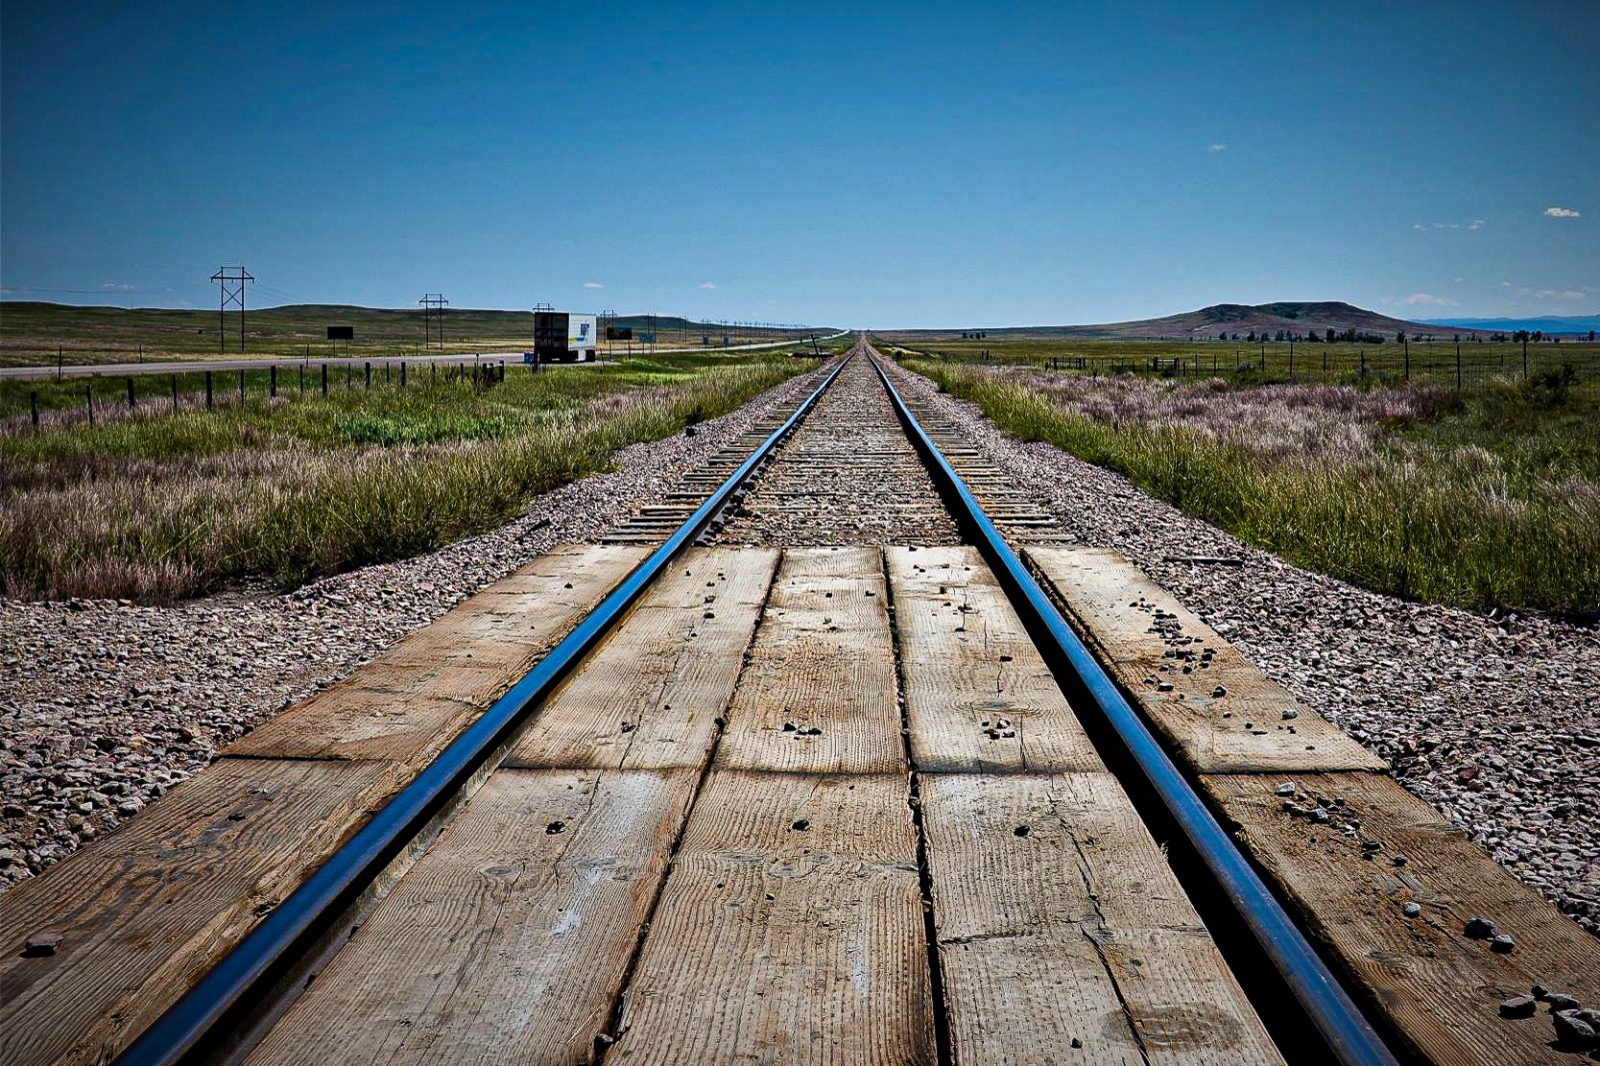 jernbanenettet i colorado usa